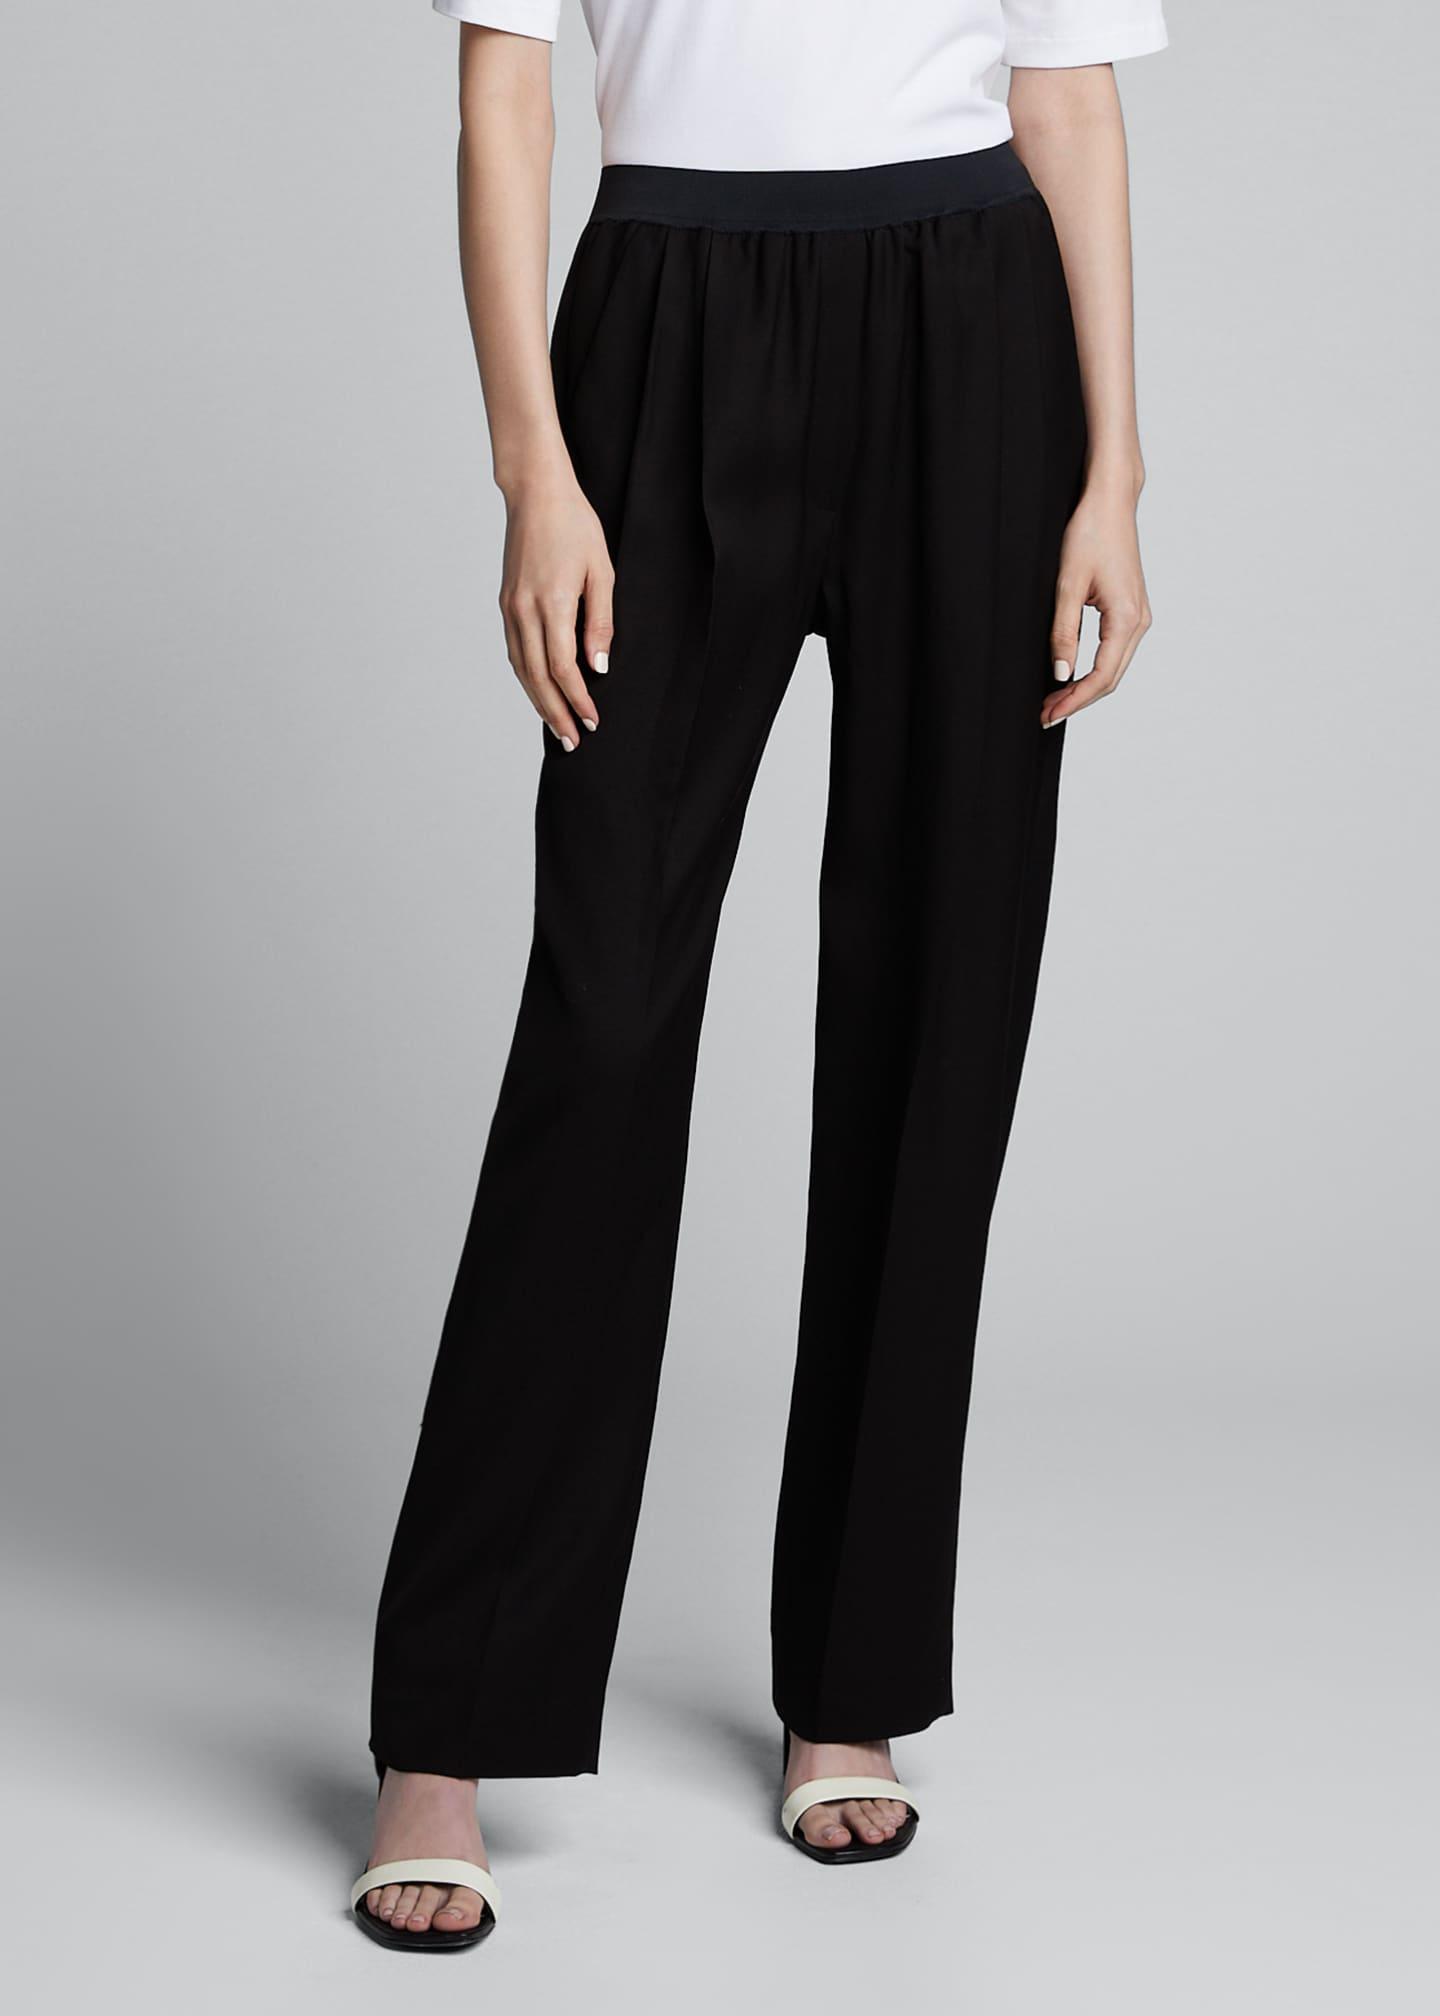 Loulou Studio Takaroa Pull-On Easy Pants